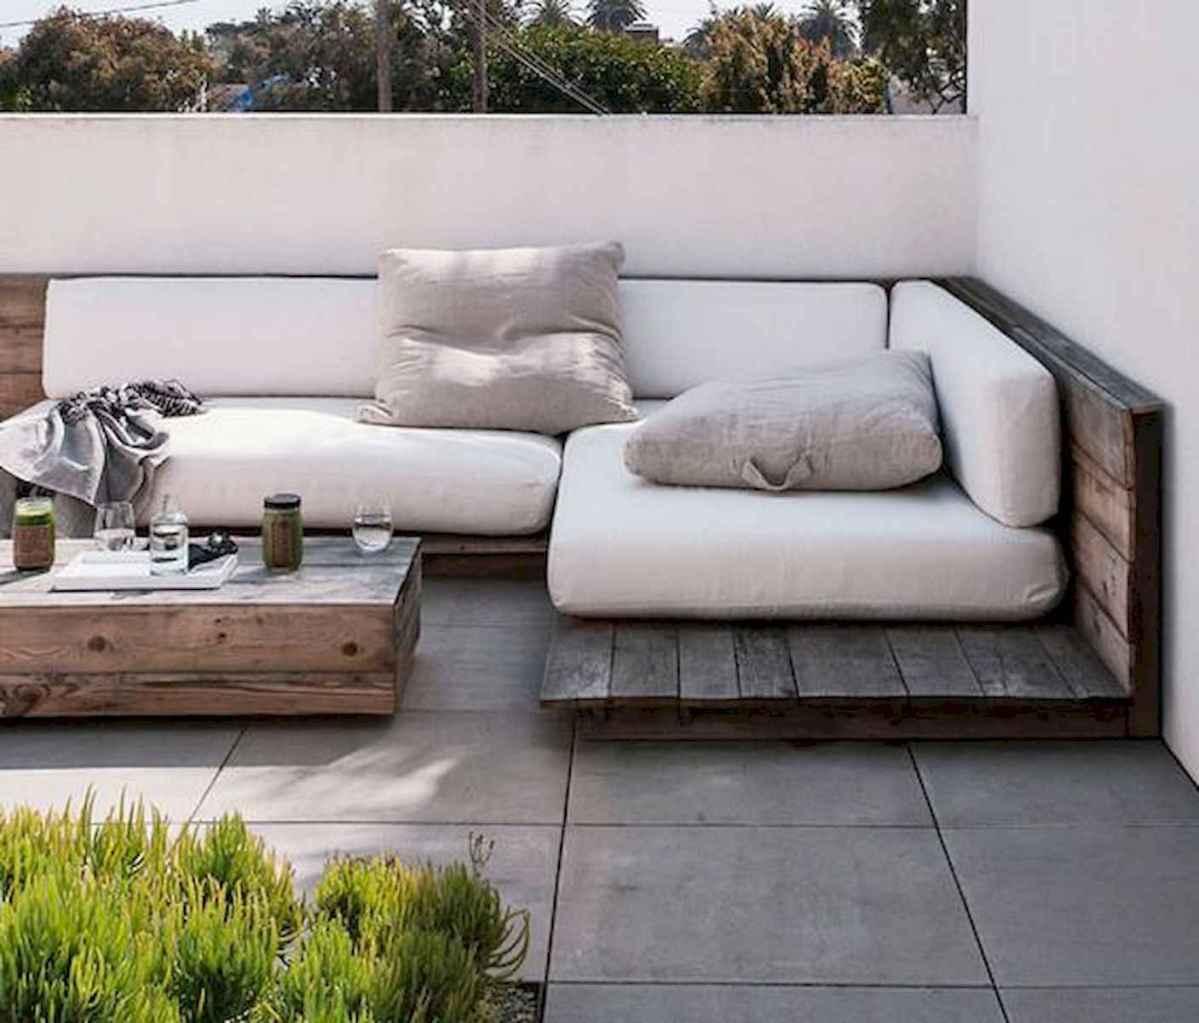 60 Amazing DIY Projects Otdoors Furniture Design Ideas (34)